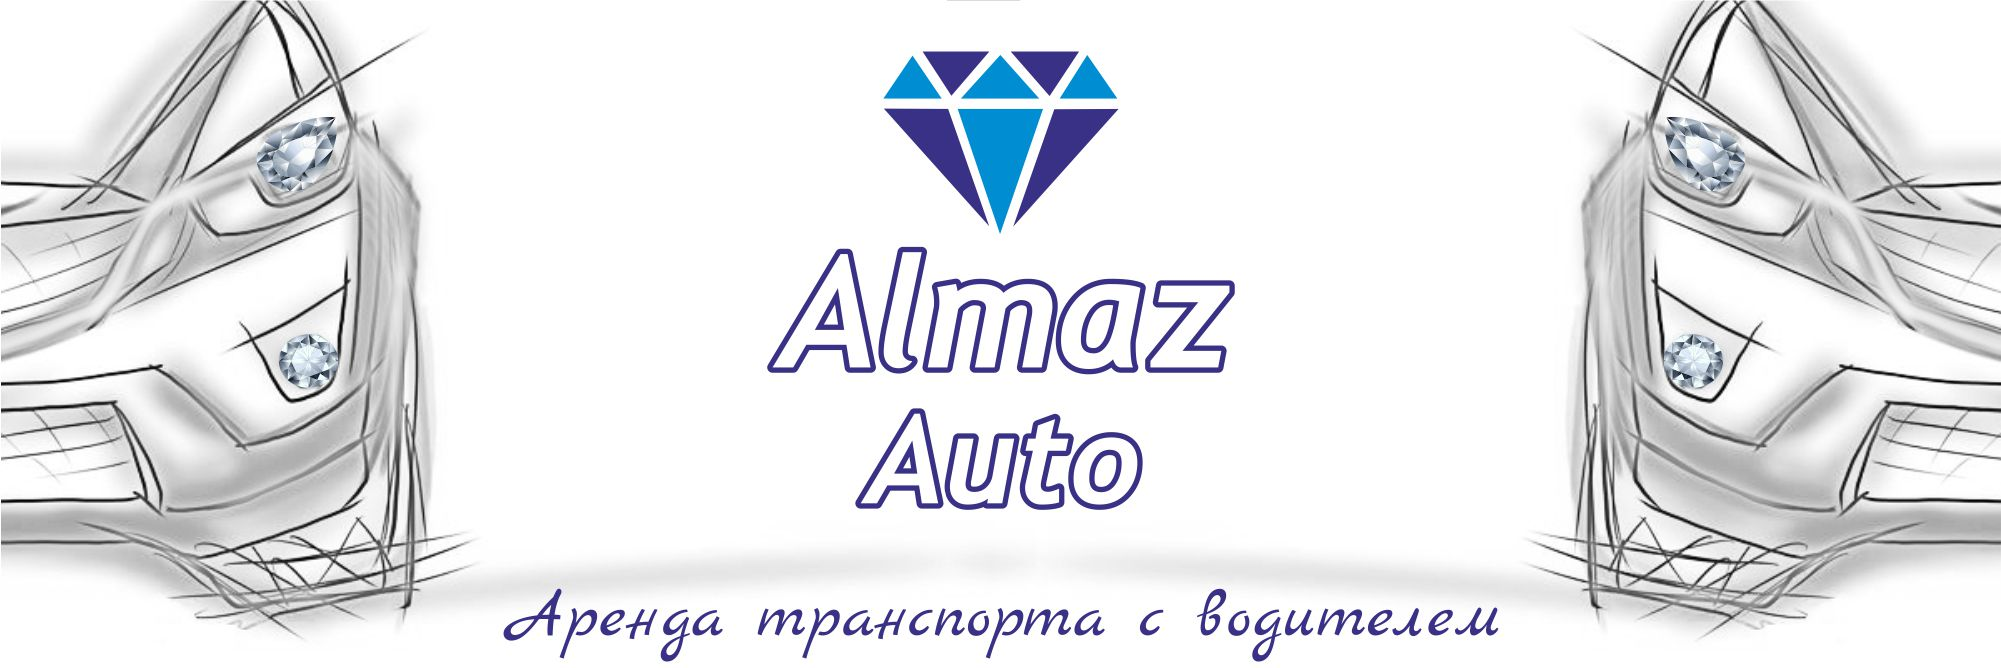 almaz-auto-slider-1200h400-mm-s-tekstom-vnizu